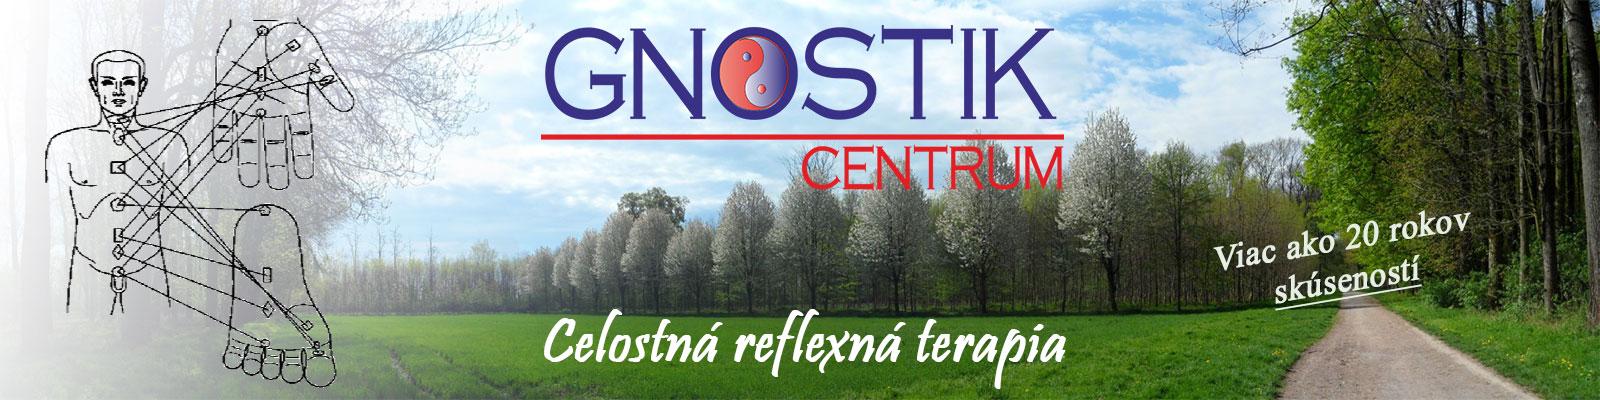 Gnostik